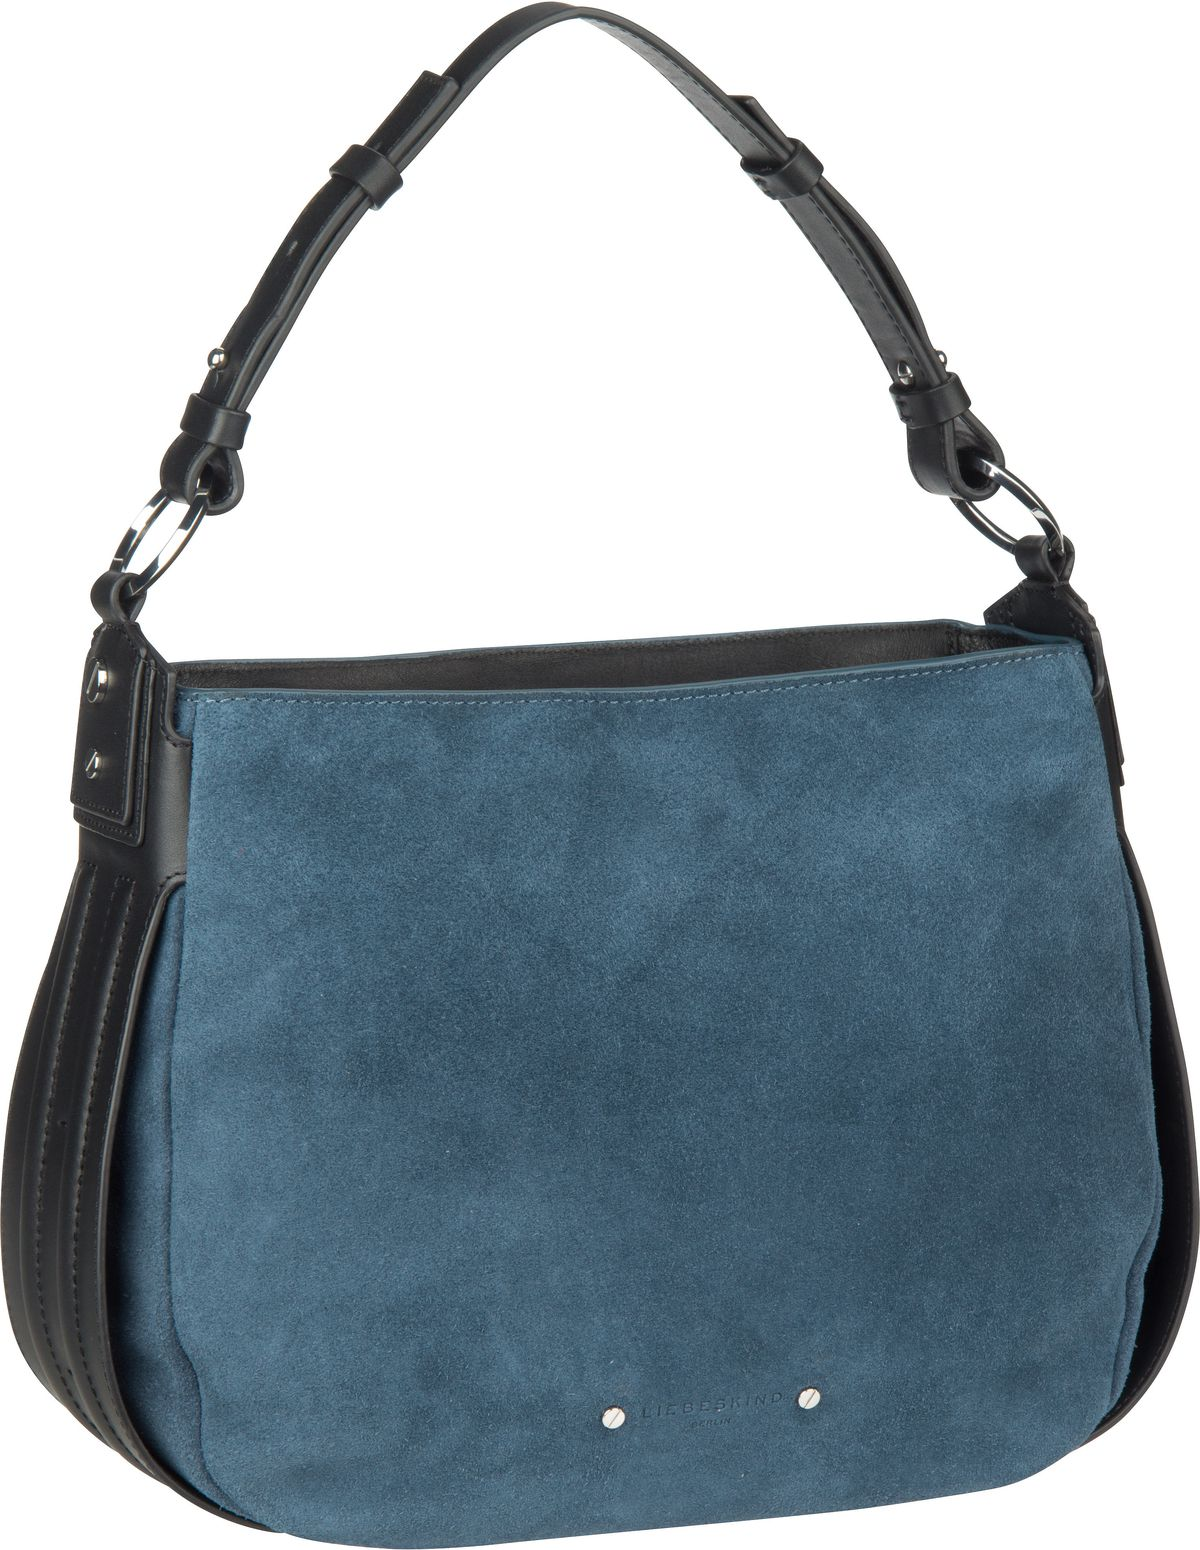 Berlin Handtasche Double Pipe Hobo S China Blue